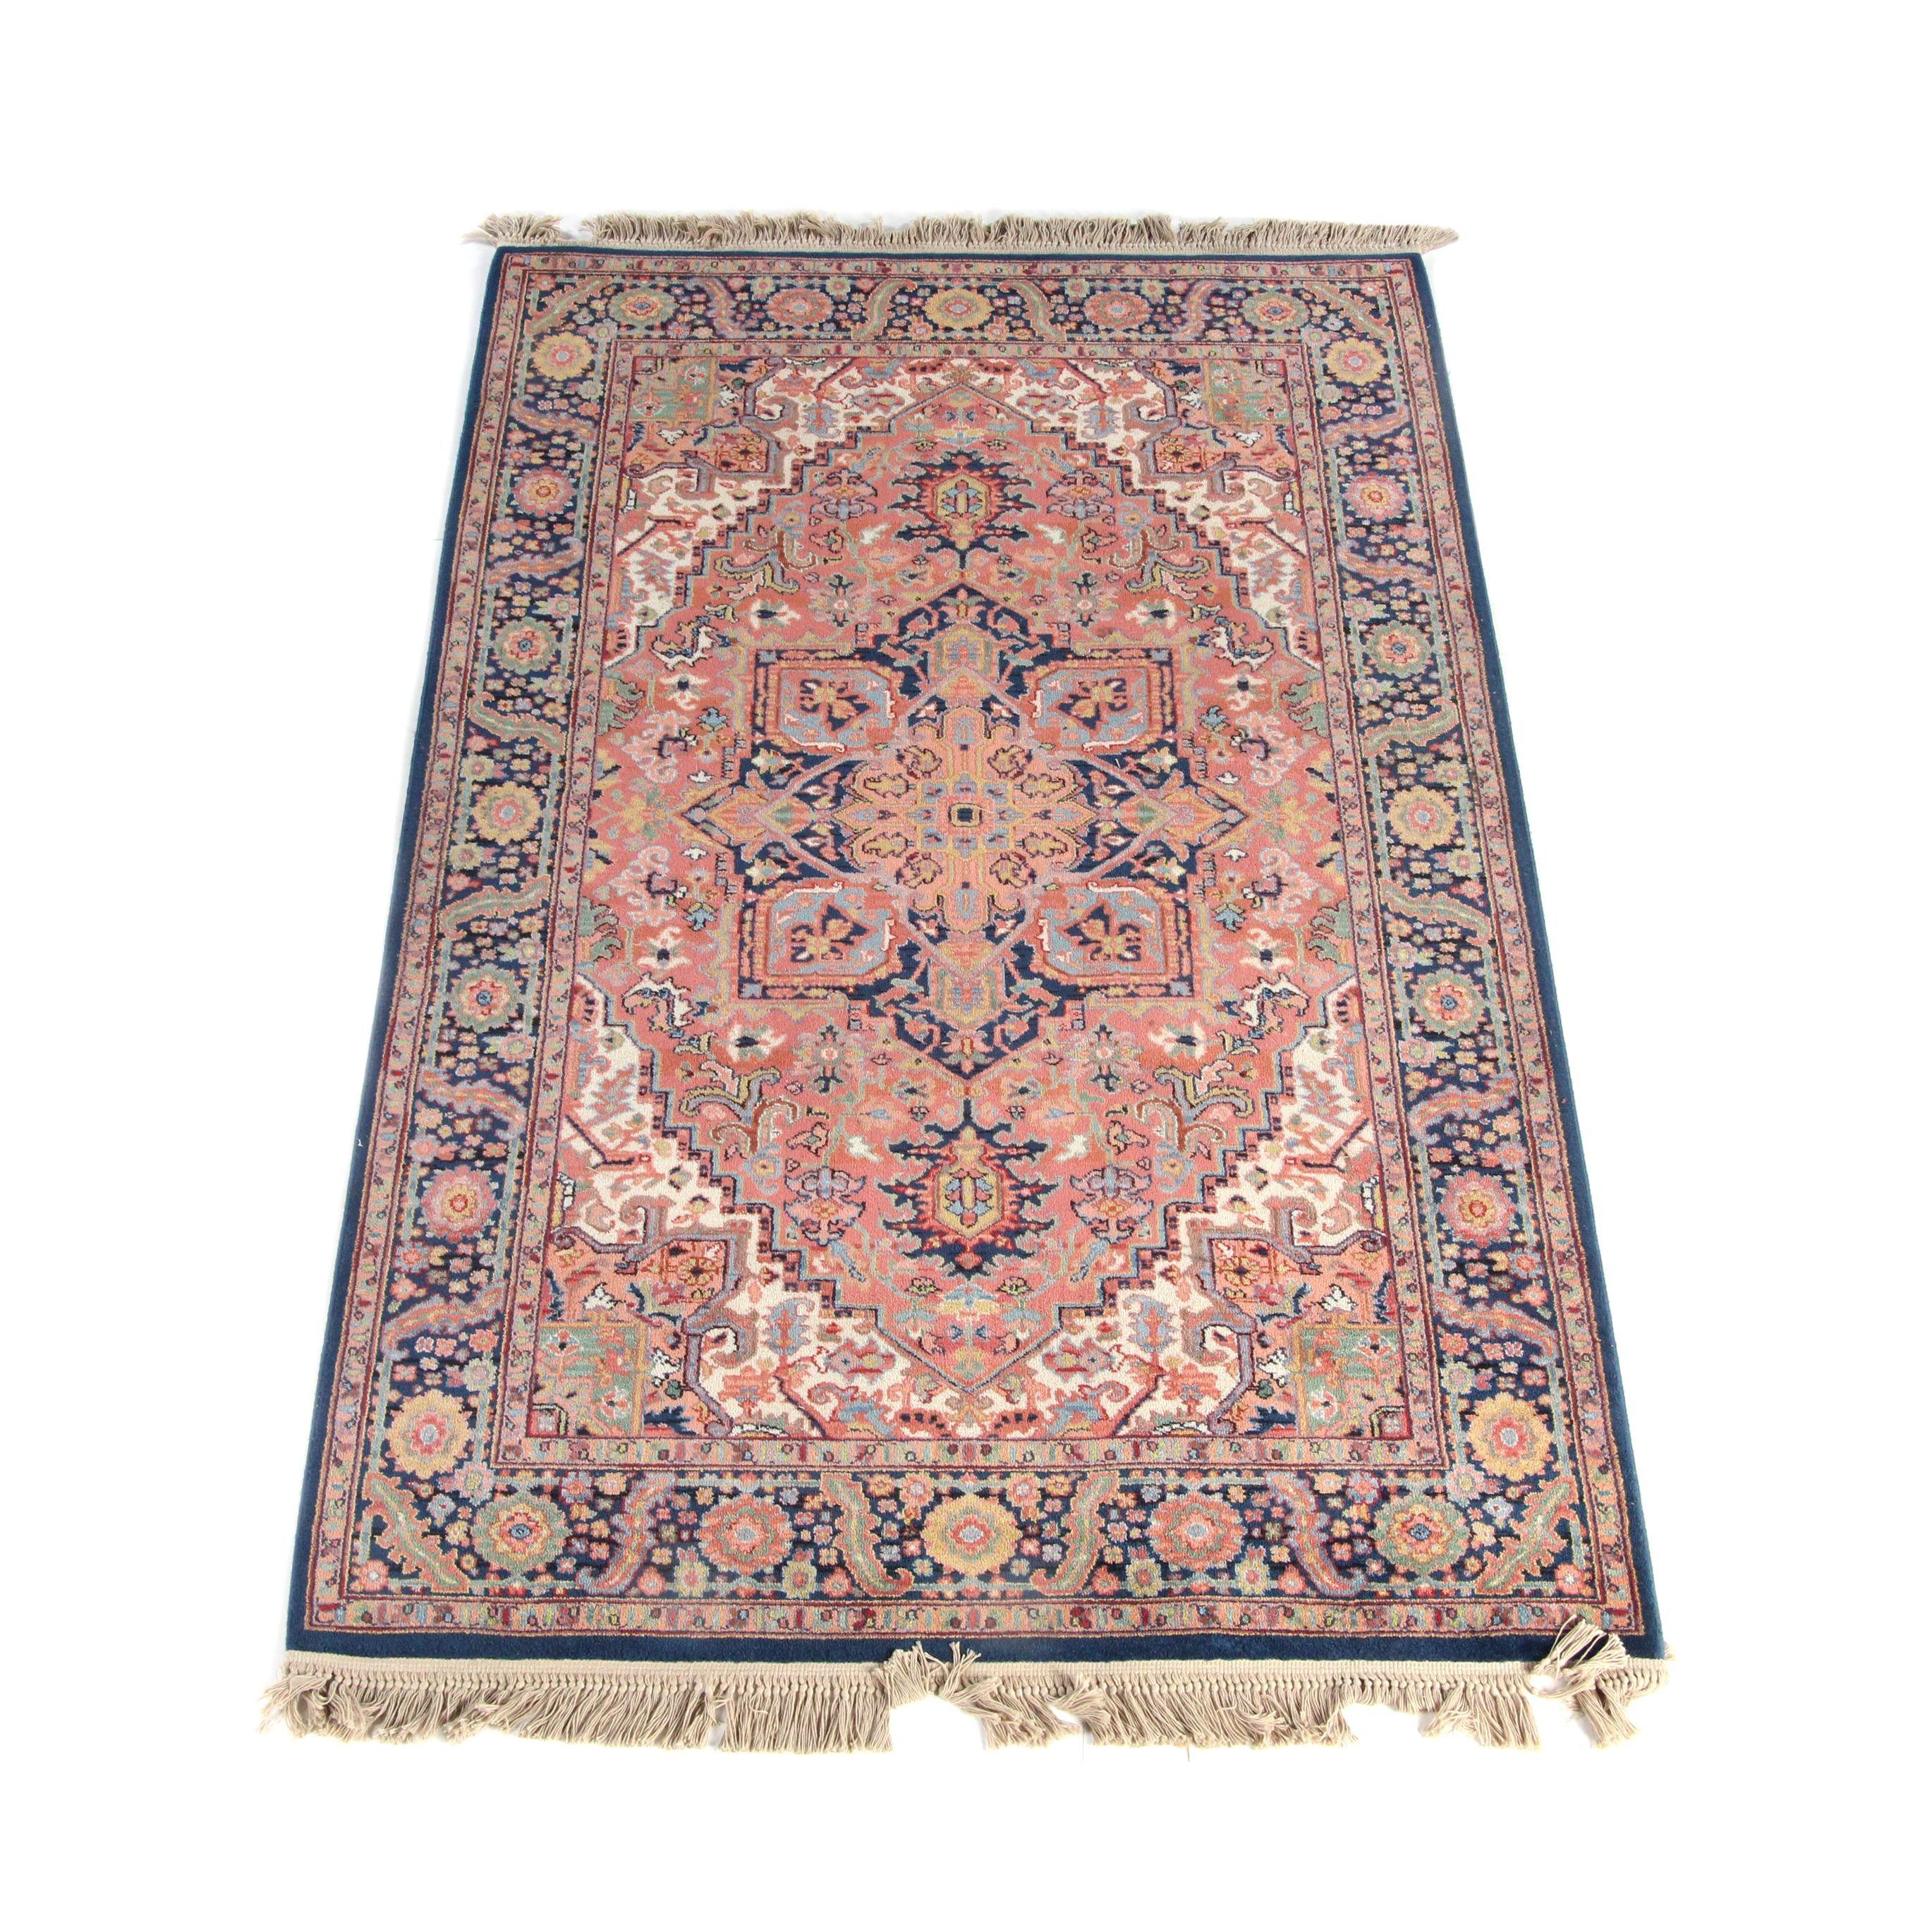 "Power-Loomed Karastan ""Heriz"" Wool Area Rug"